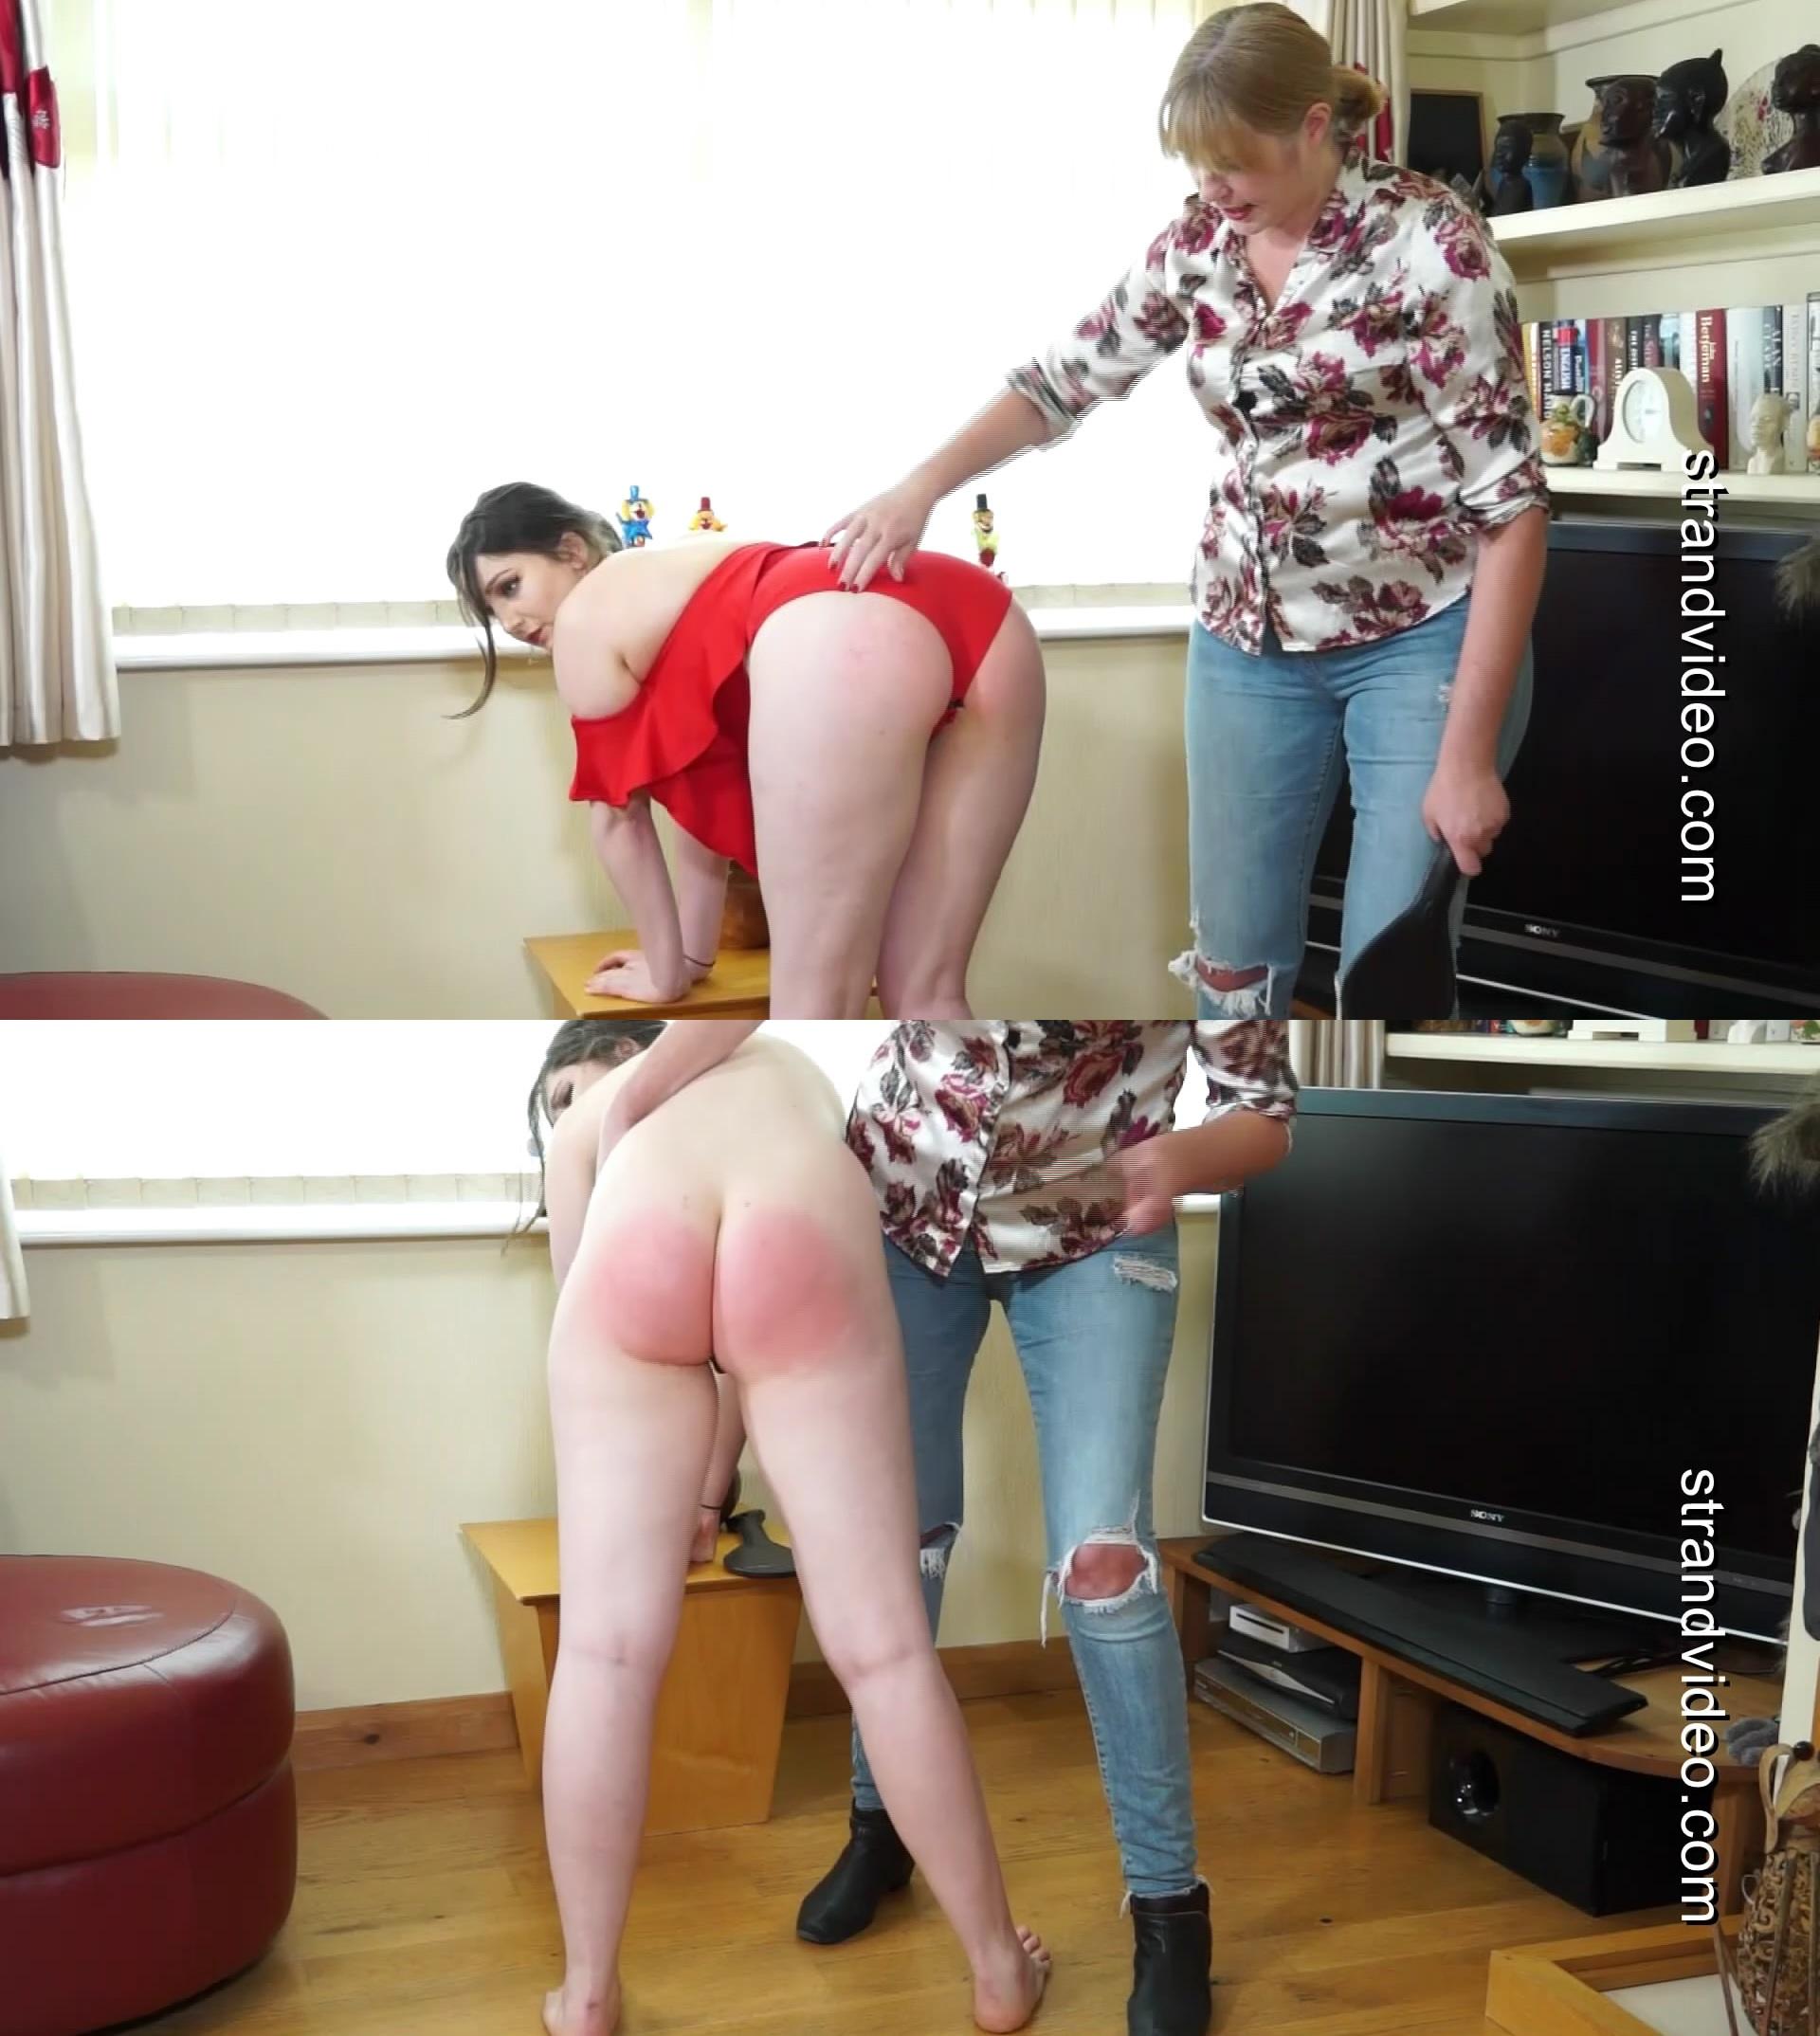 Spanking Sarah – MP4/Full HD – Alexa Jones, Sarah Stern – Not the fashion